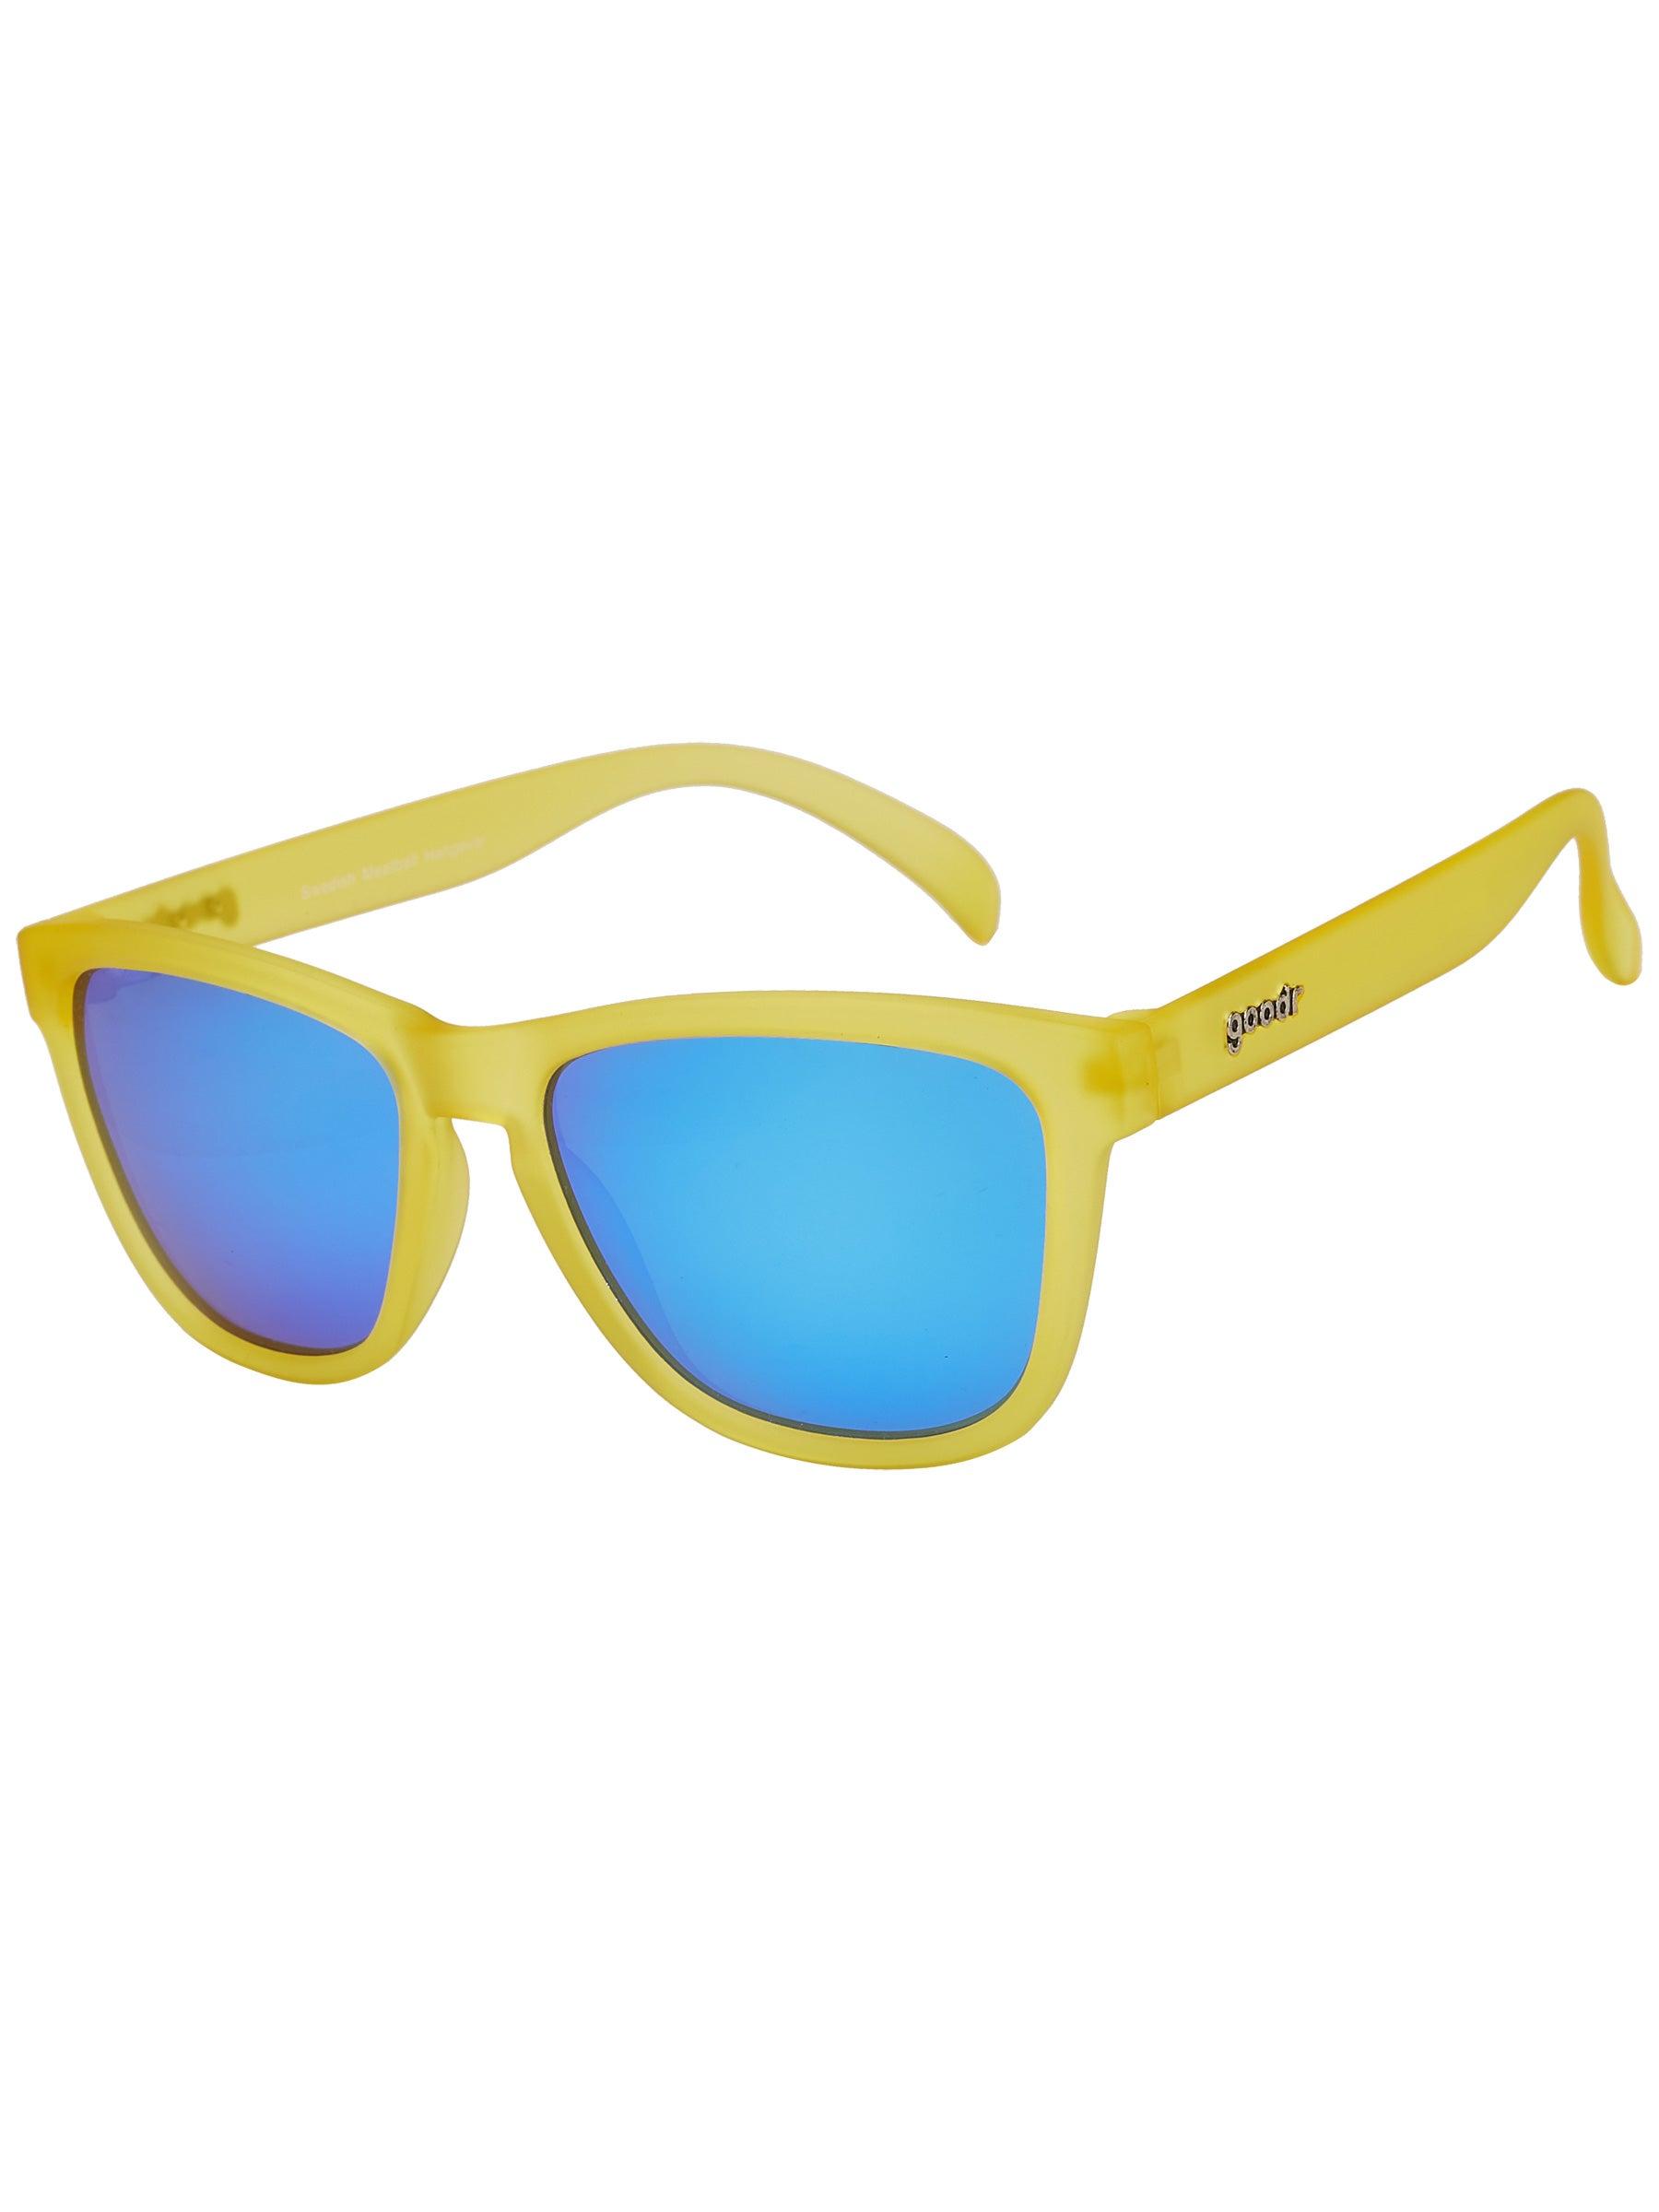 Goodr Swedish Meatball Hangover Running Sunglasses